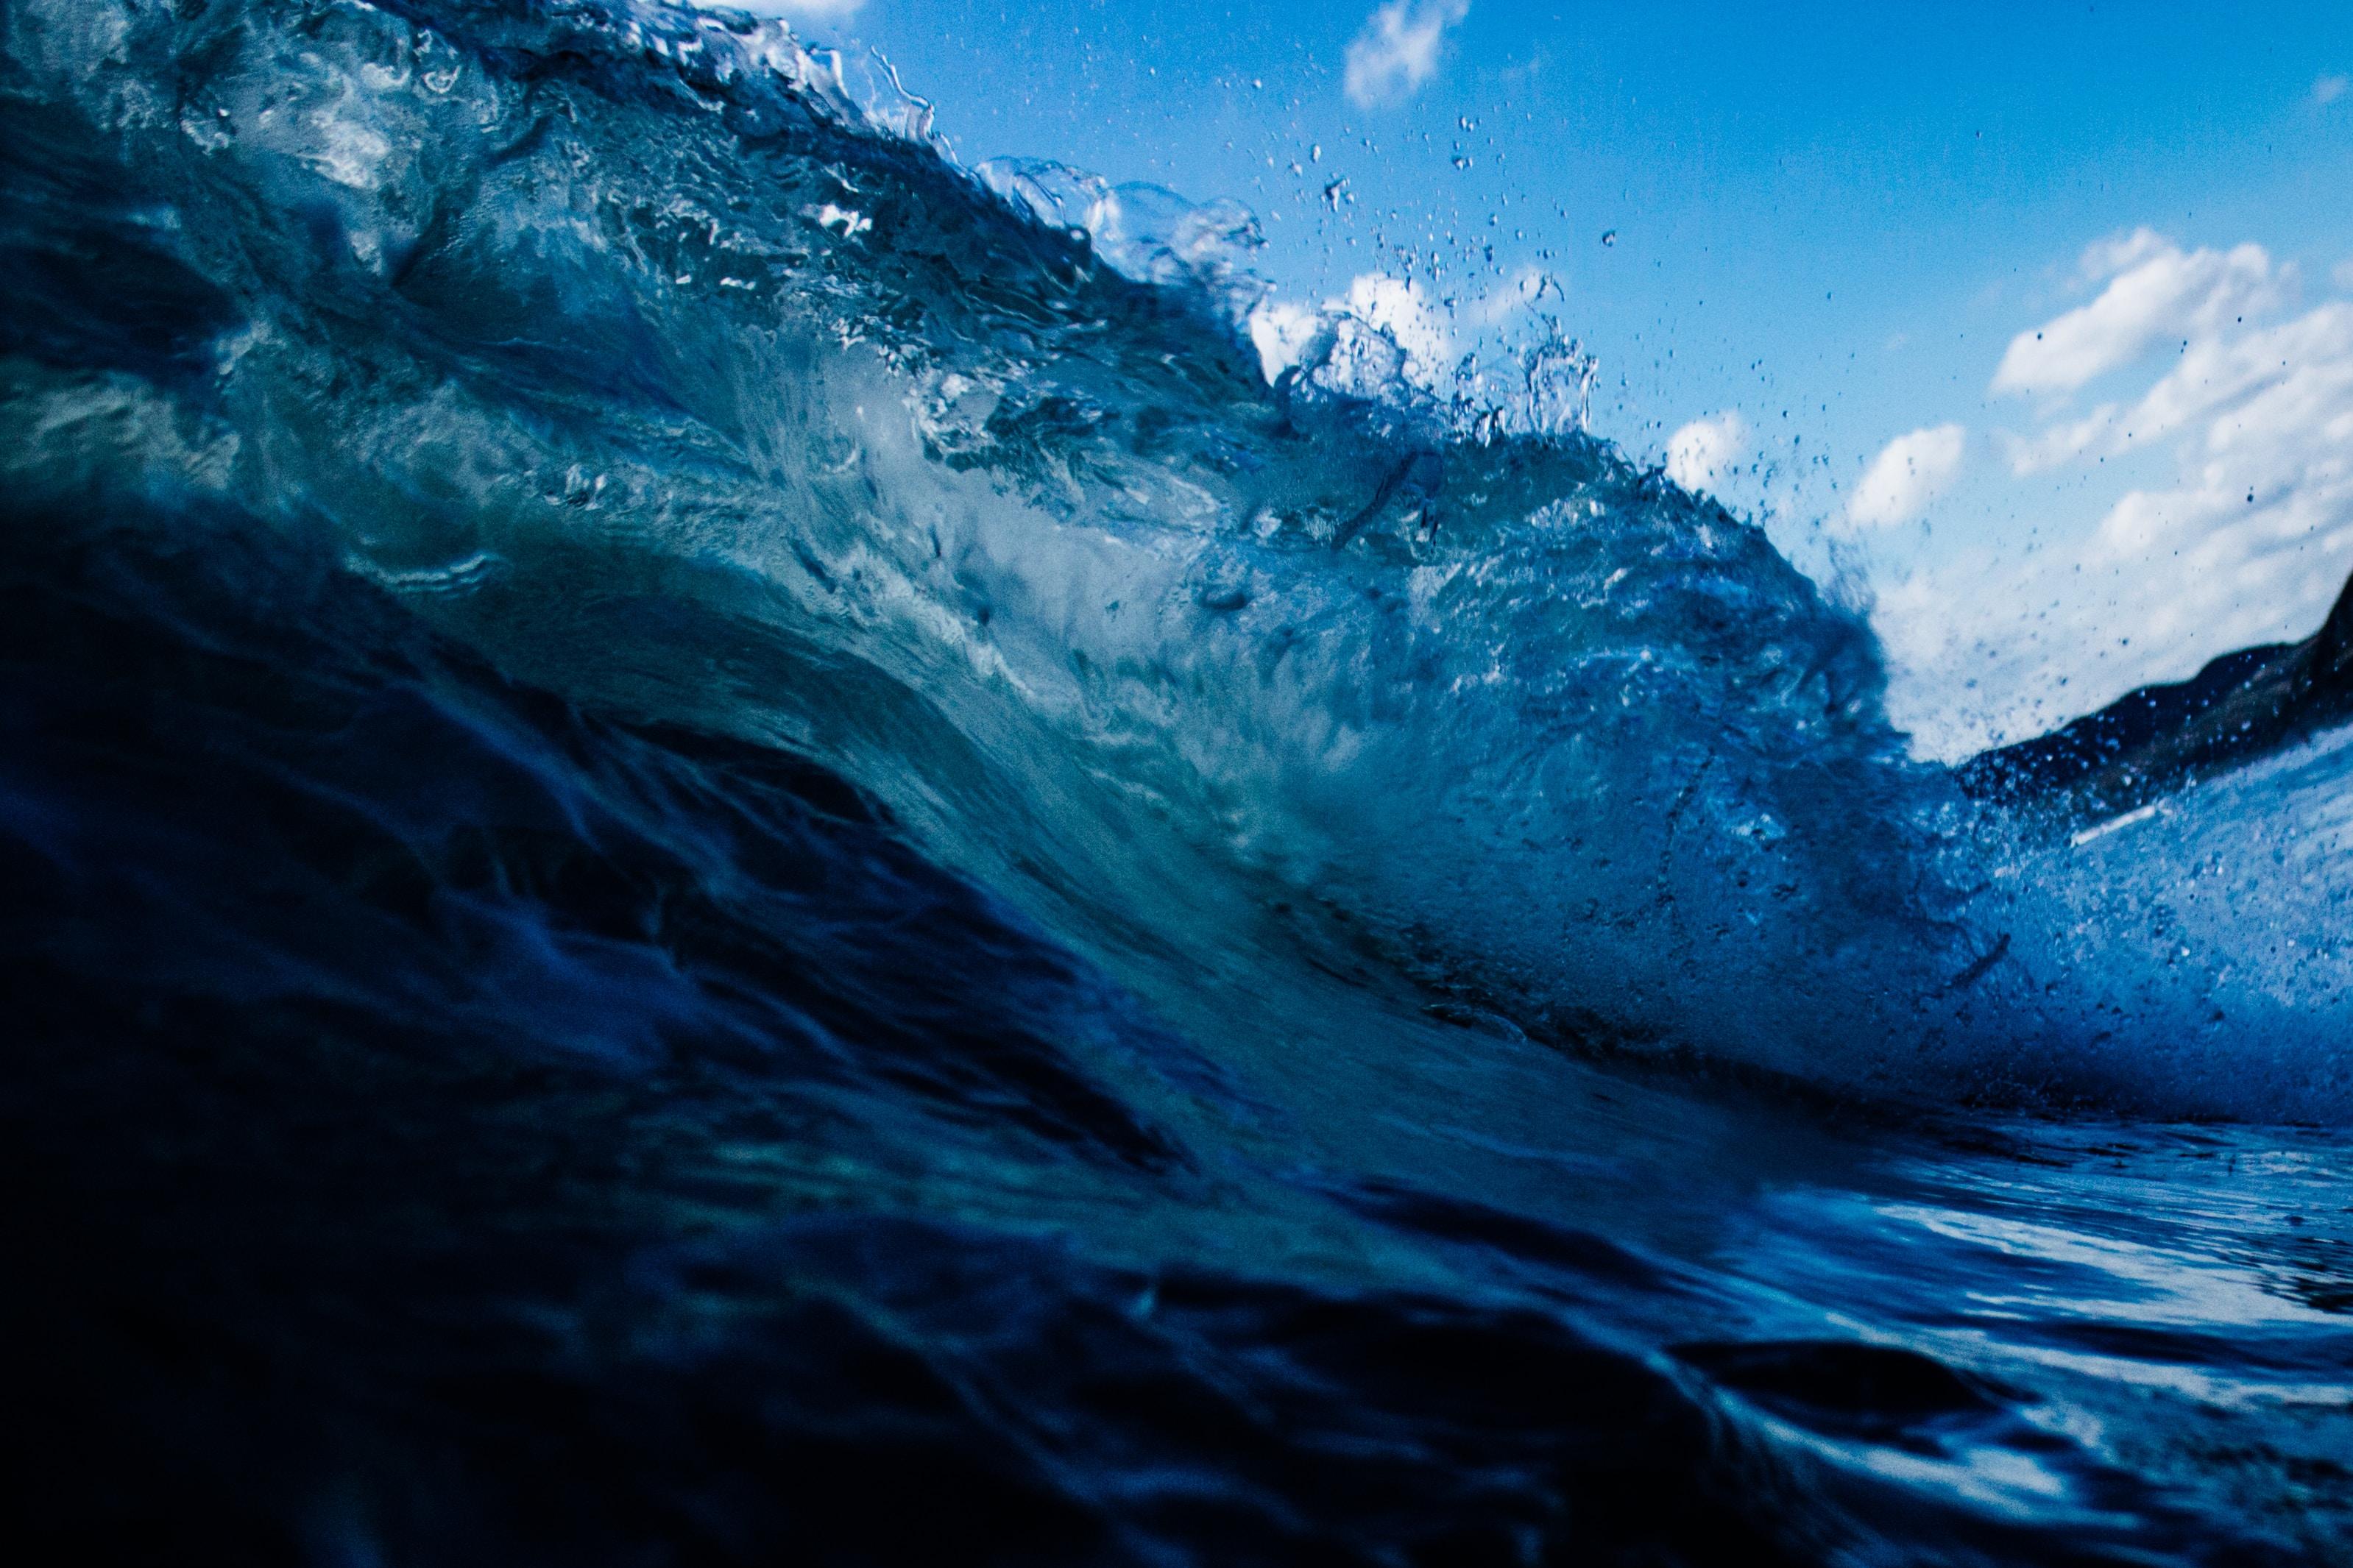 Wave splash of the blue ocean at Ngarunui Beach